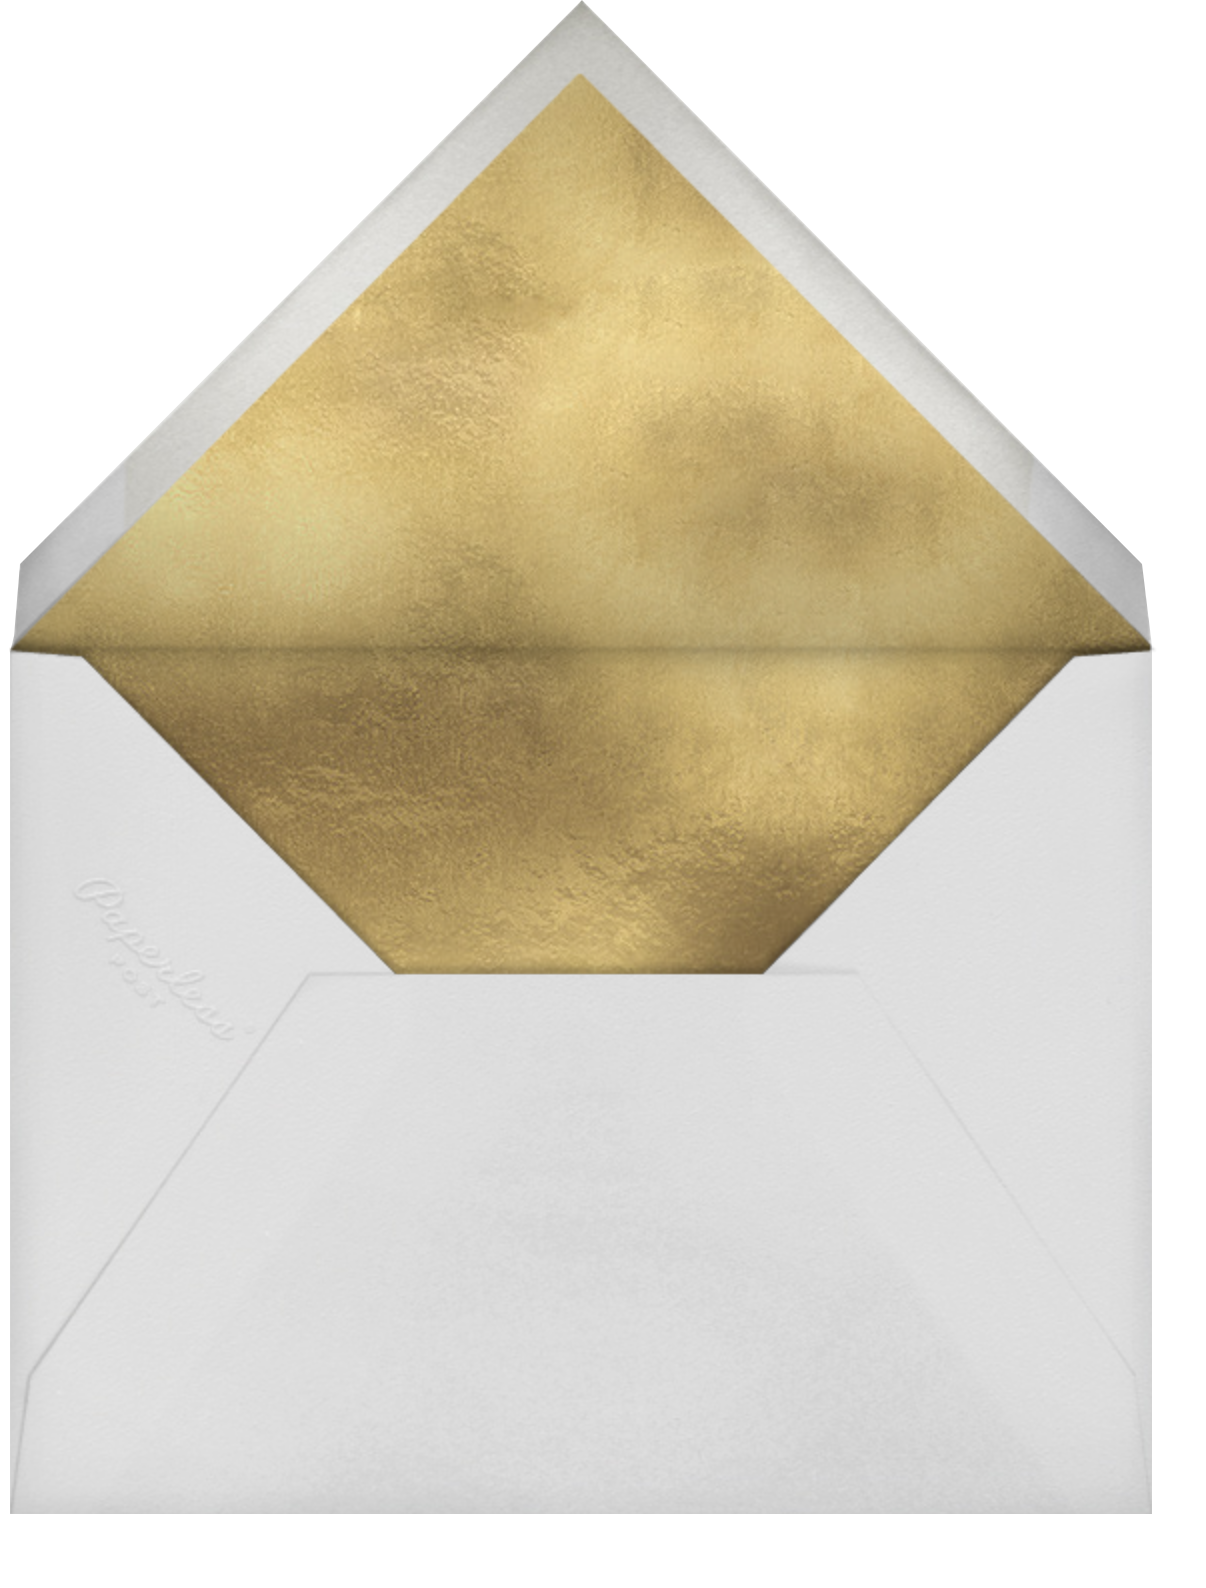 Penrose - Jonathan Adler - Virtual parties - envelope back